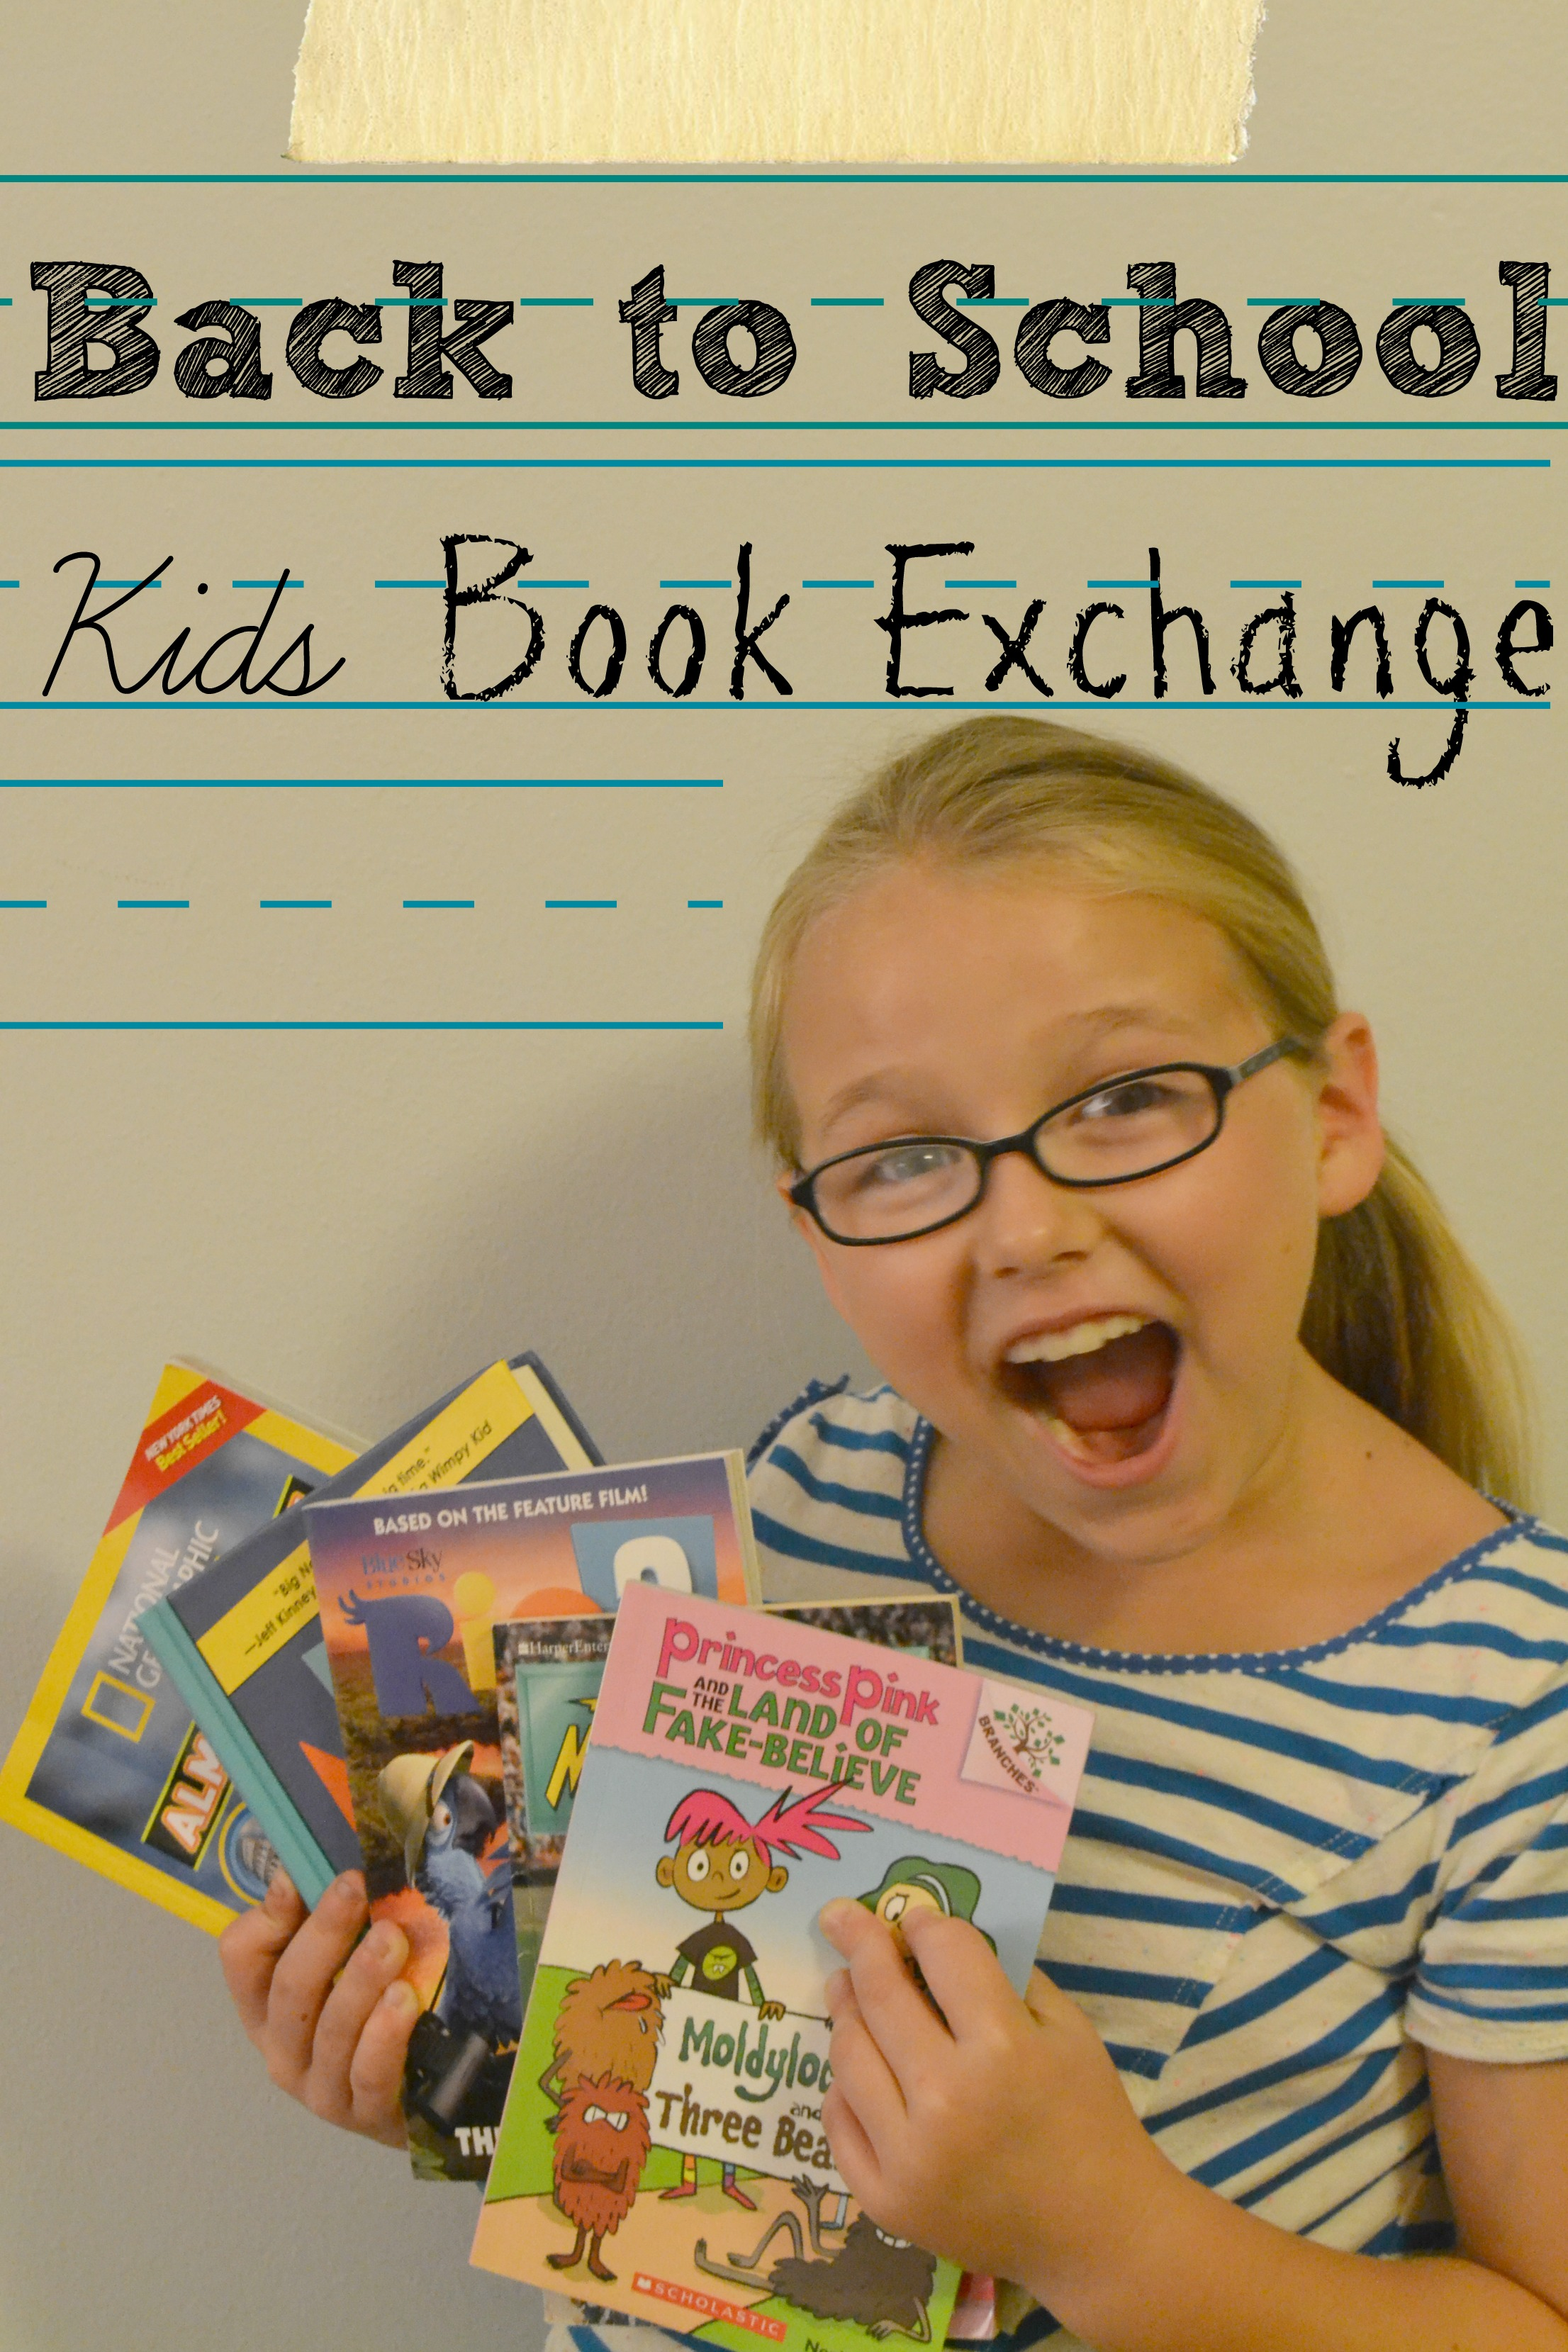 Back to School Book Exchange